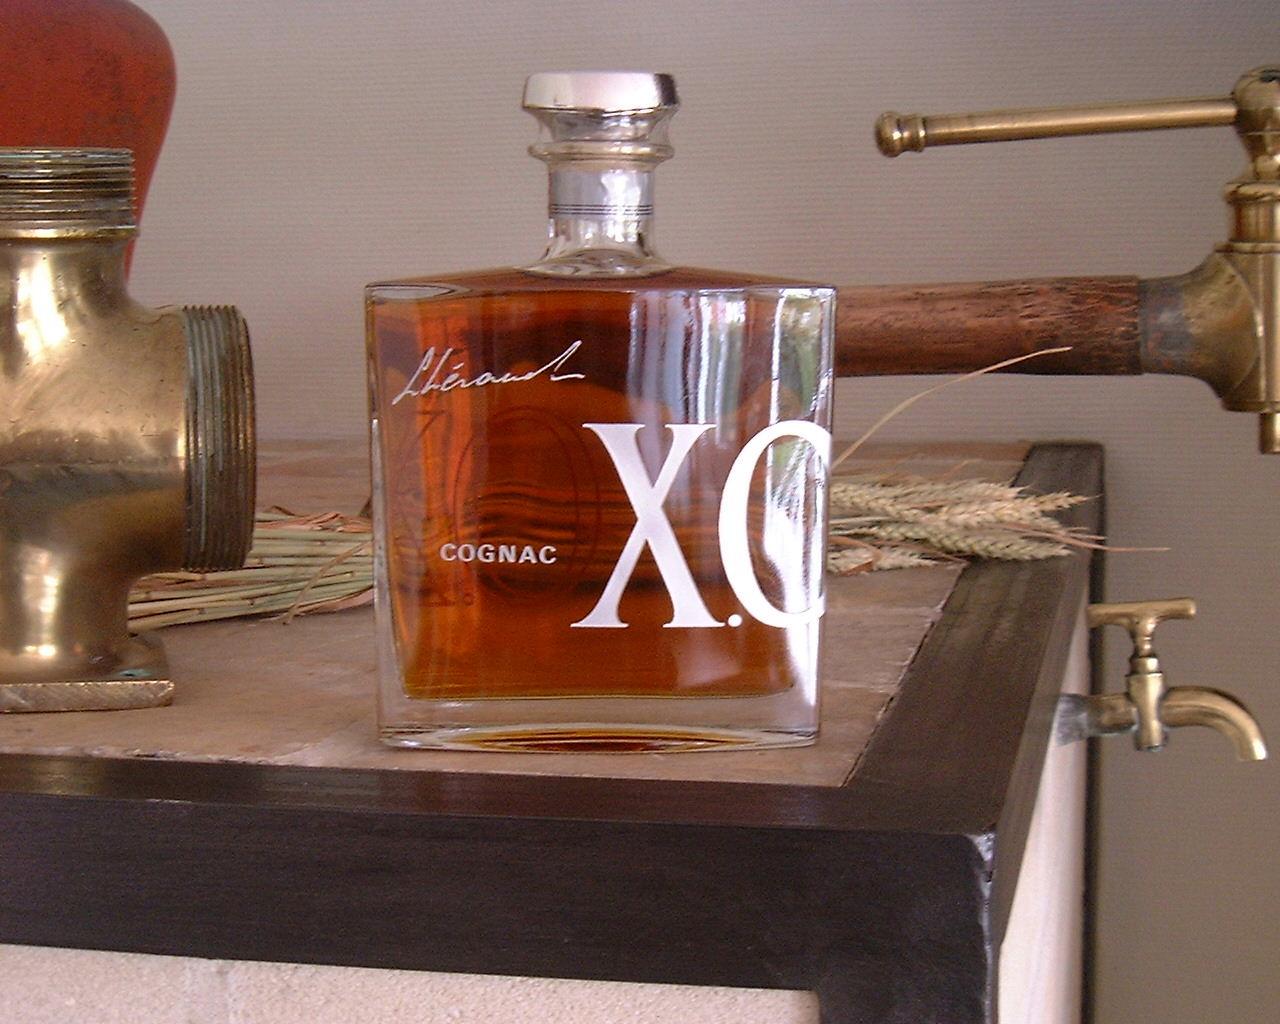 Cognac Lheraud XO Eugenie